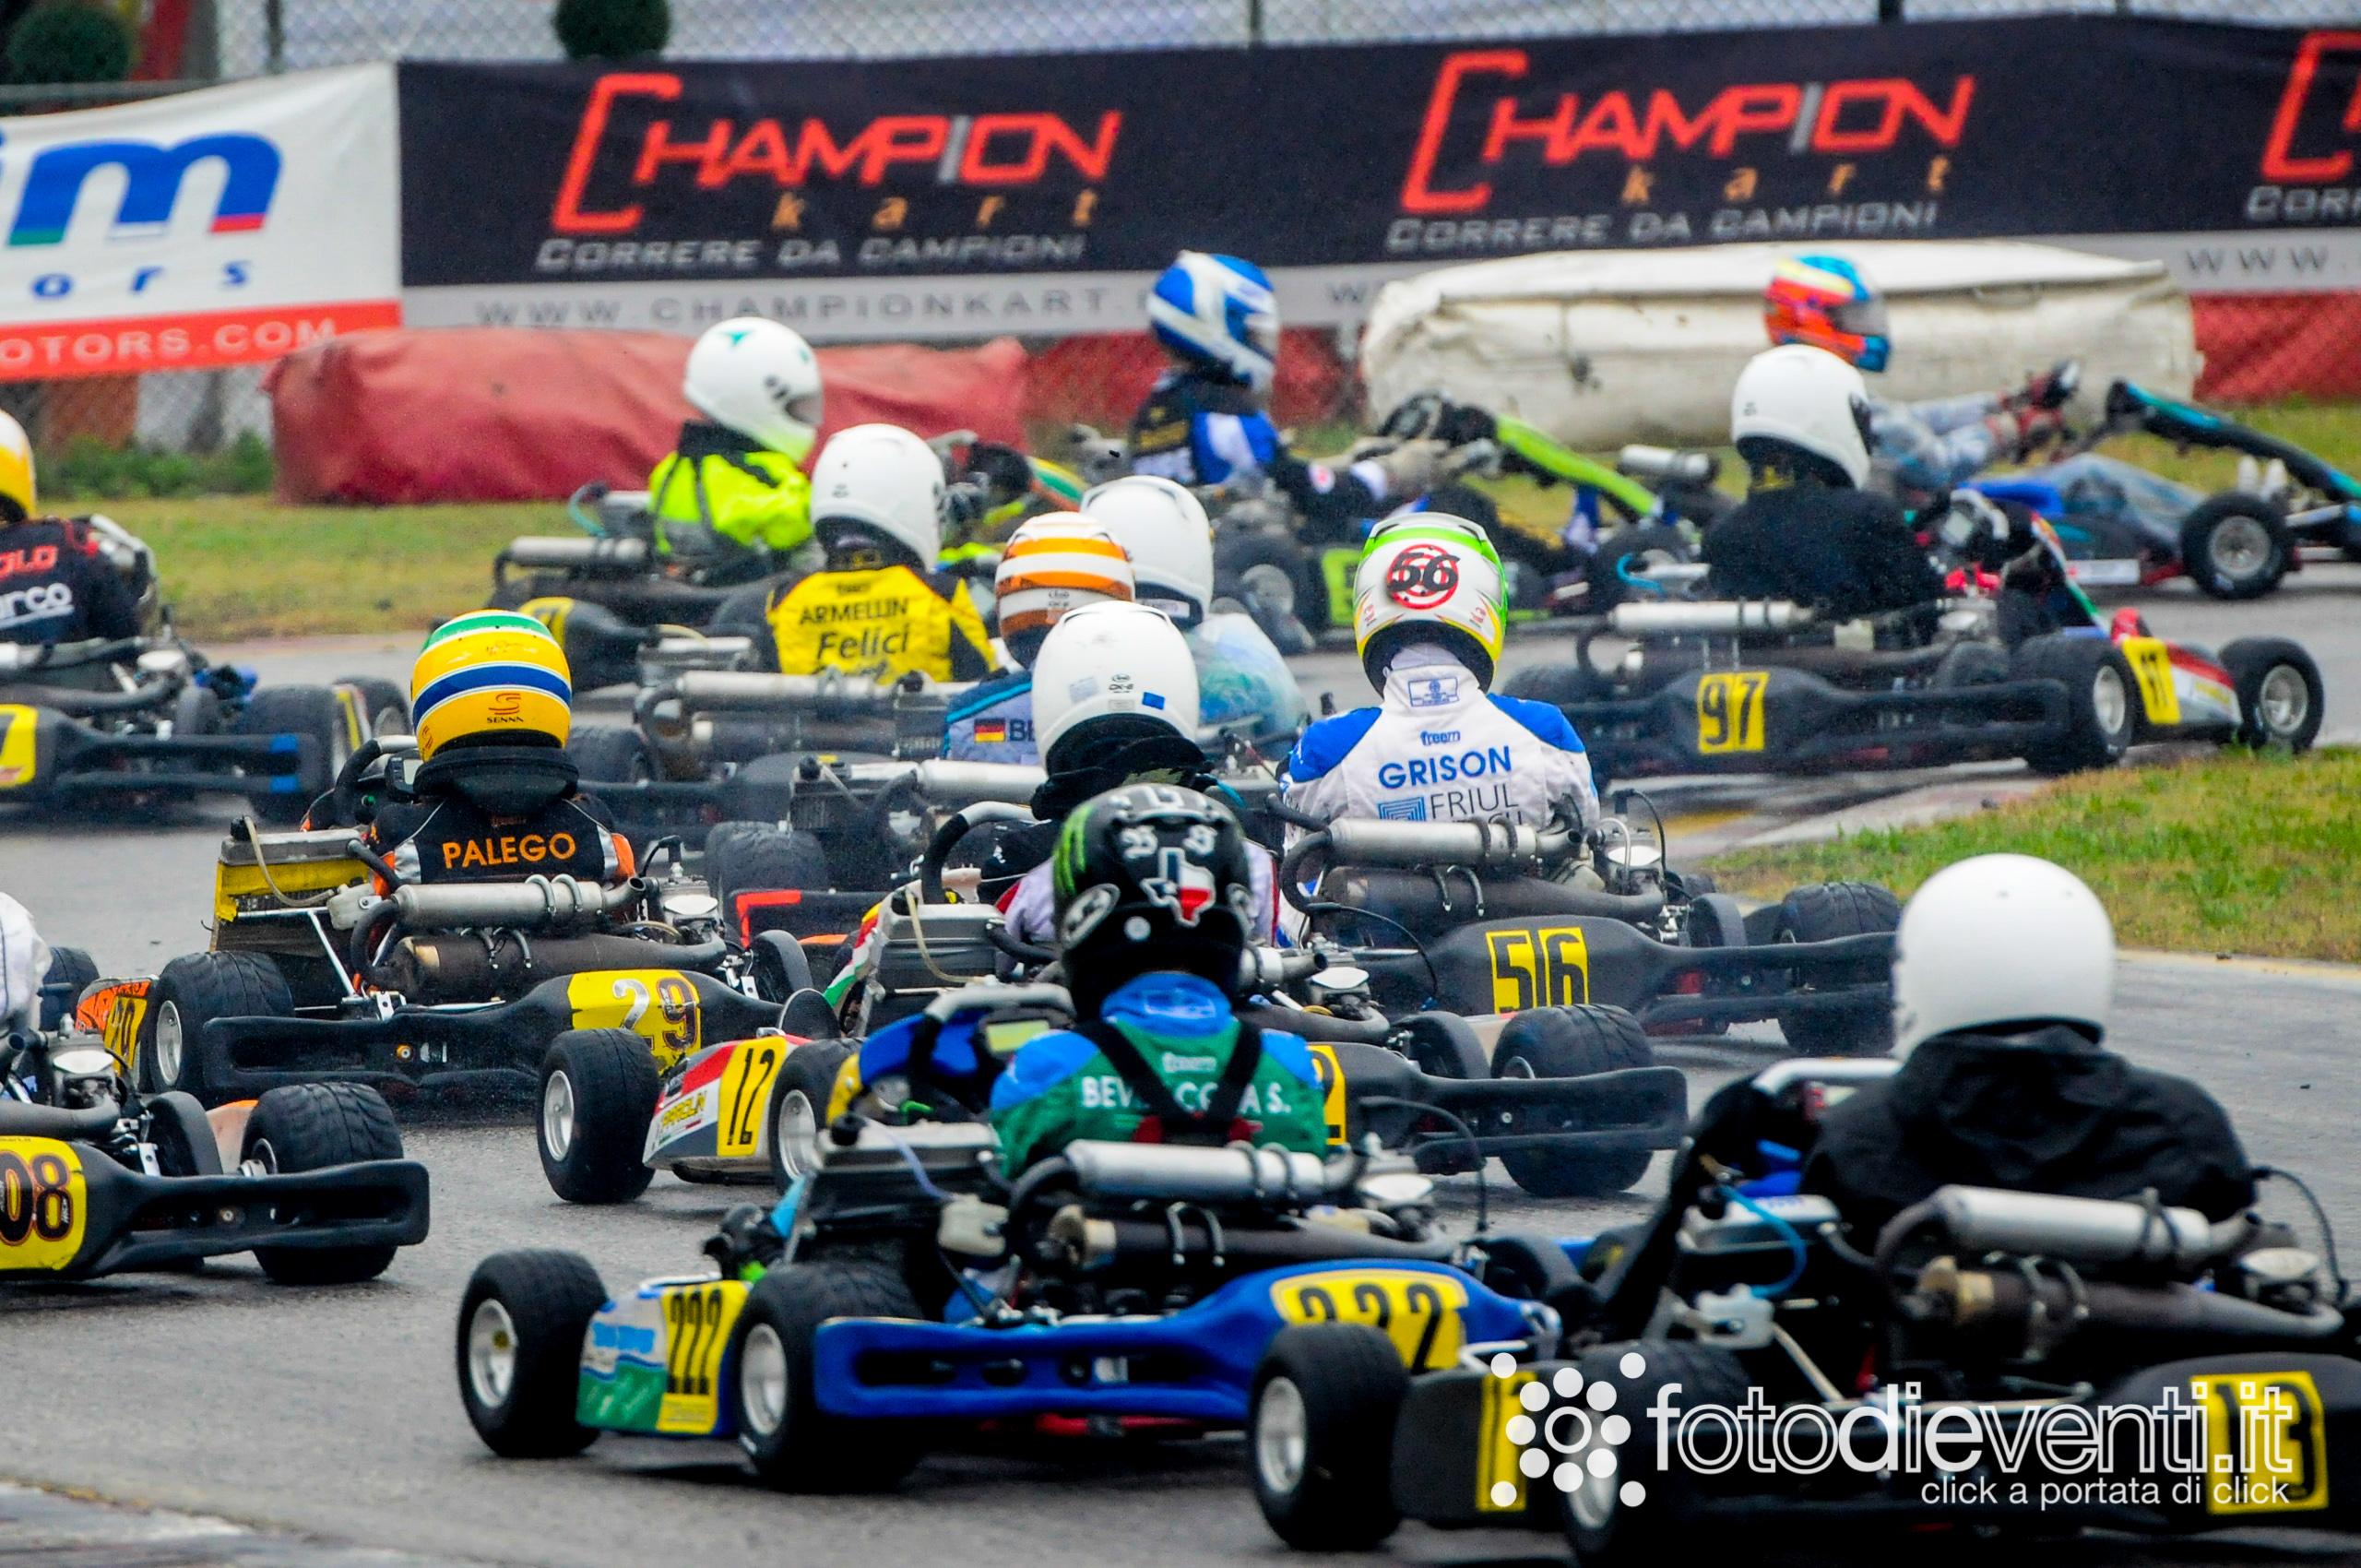 Championkart International Final 2013